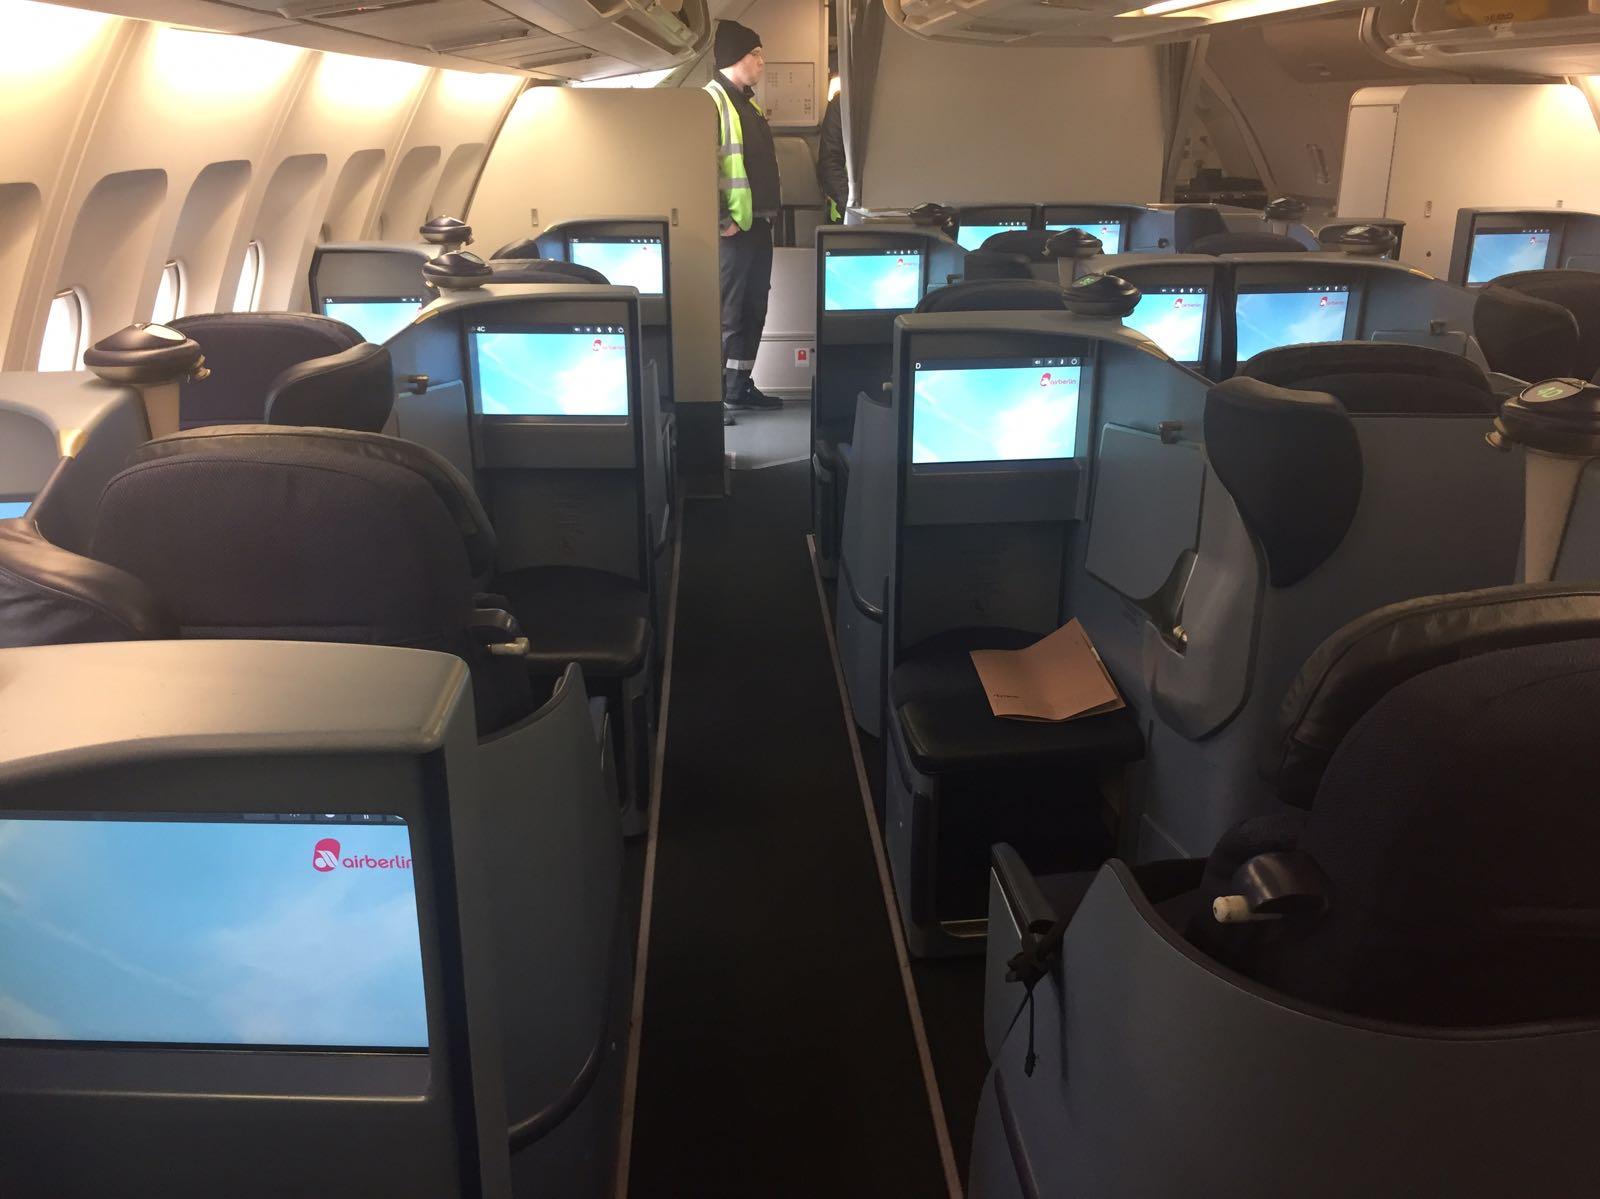 Salto De Wamos  Suma Dos Modernos A330 De Air Berlin